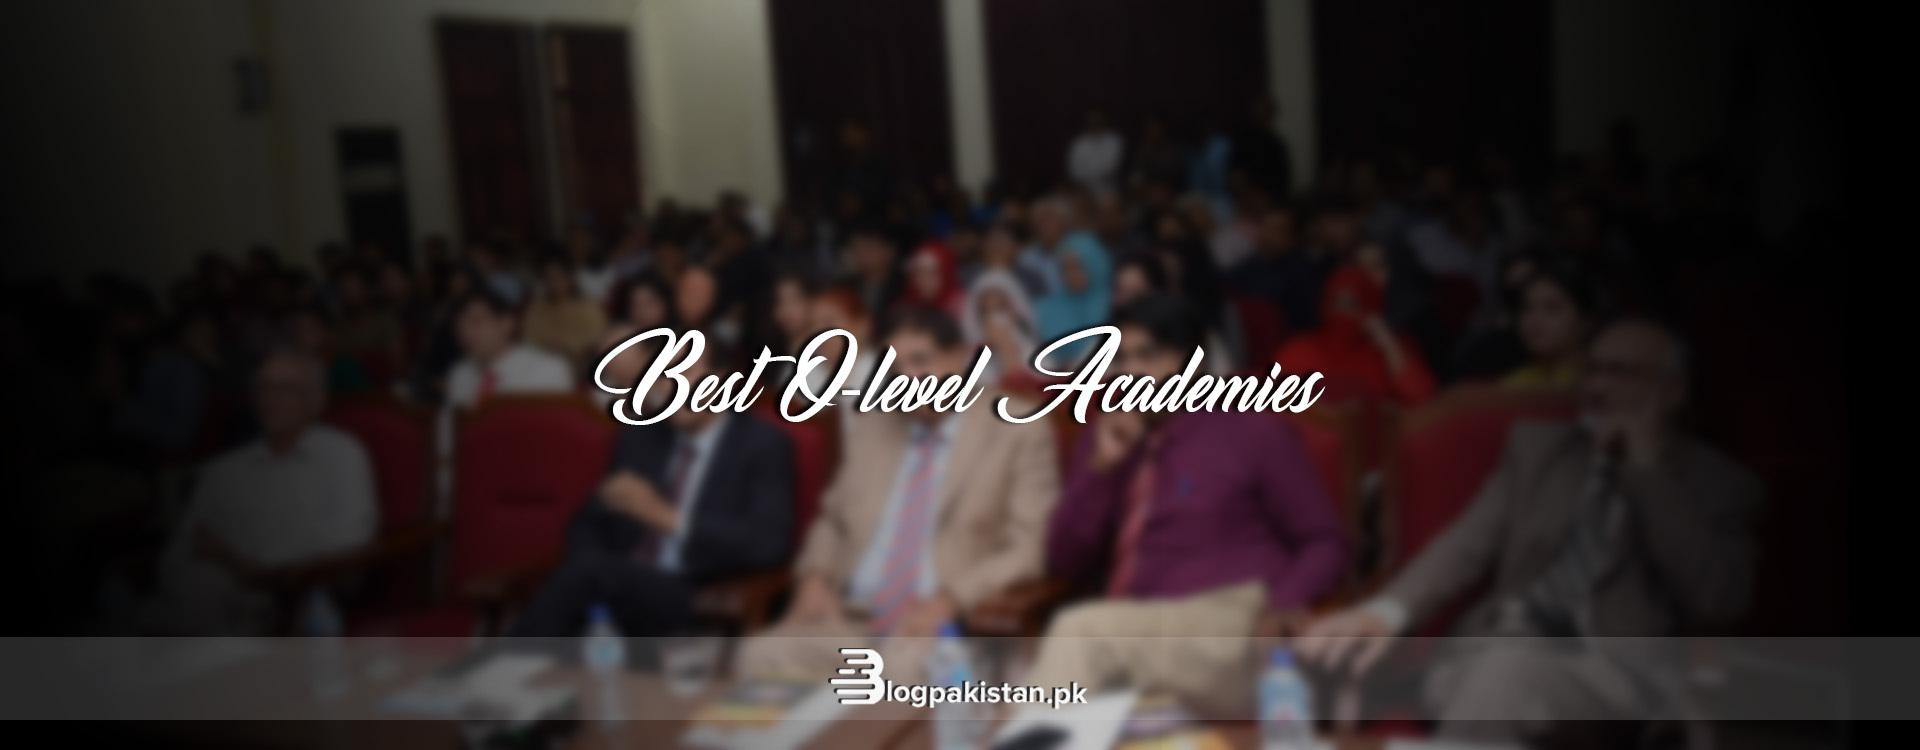 Best O-level academies in Islamabad and Rawalpindi